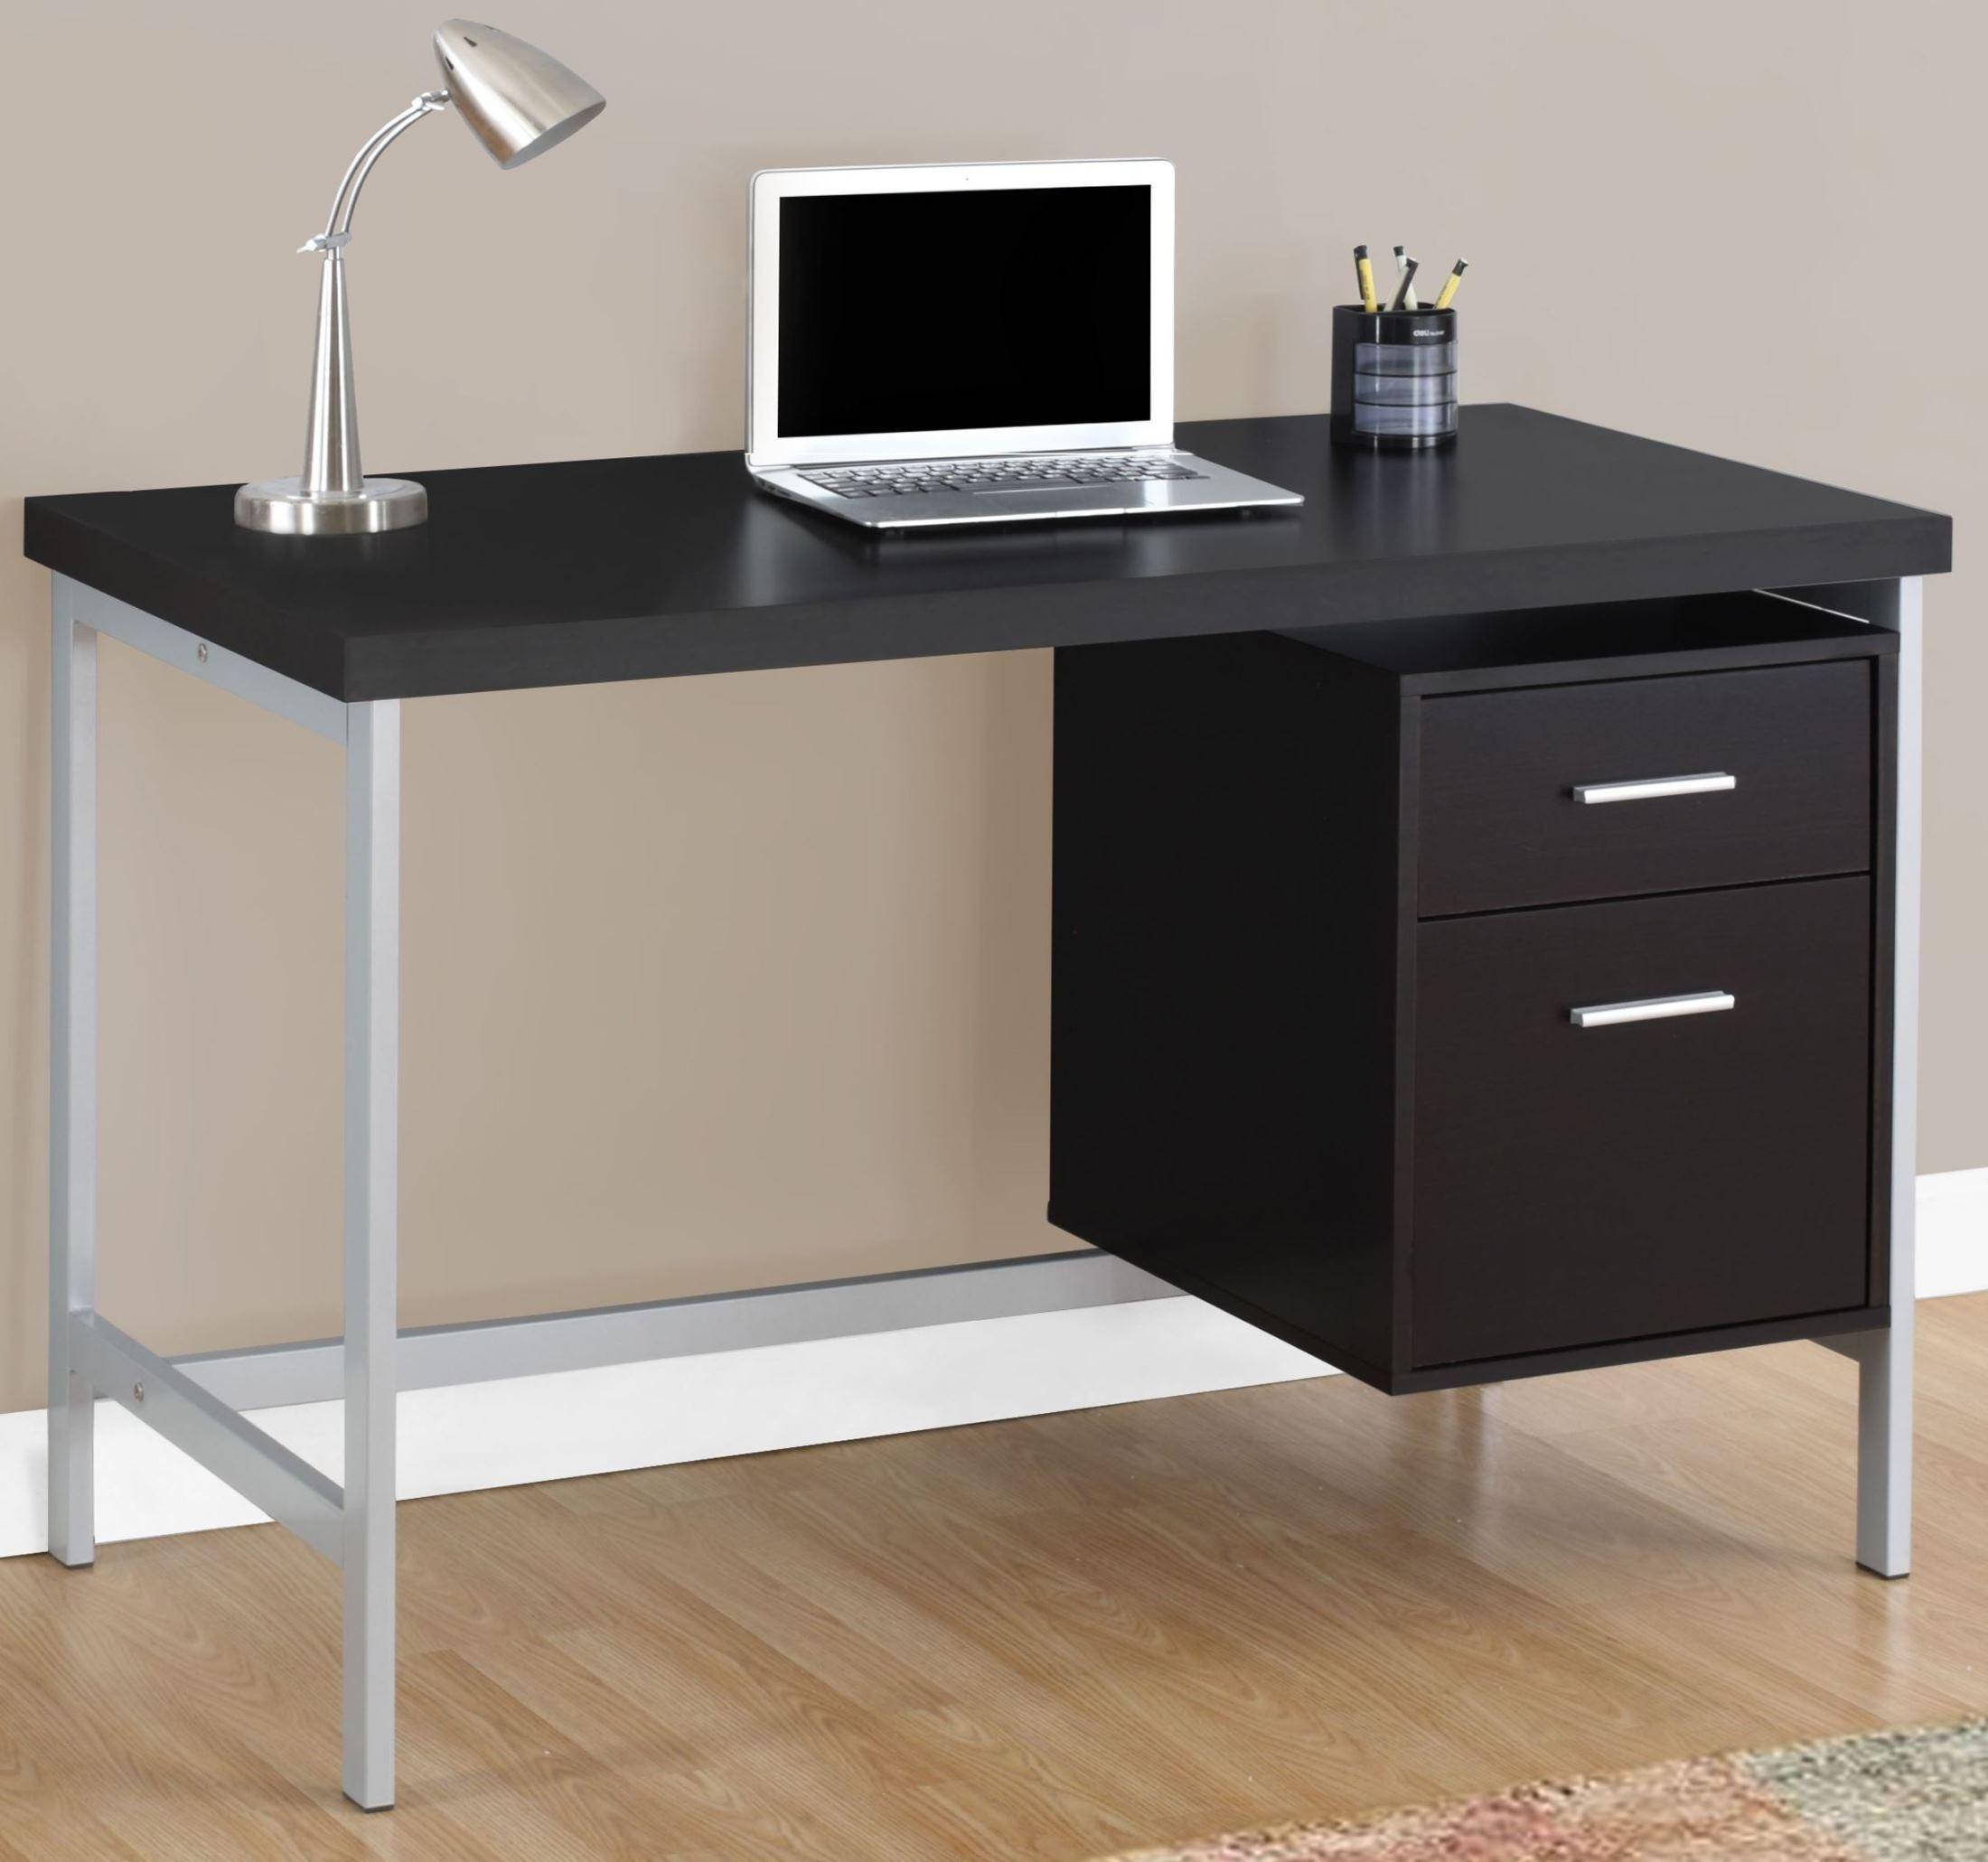 Cappuccino 48 Quot Storage Drawer Computer Desk 7148 Monarch